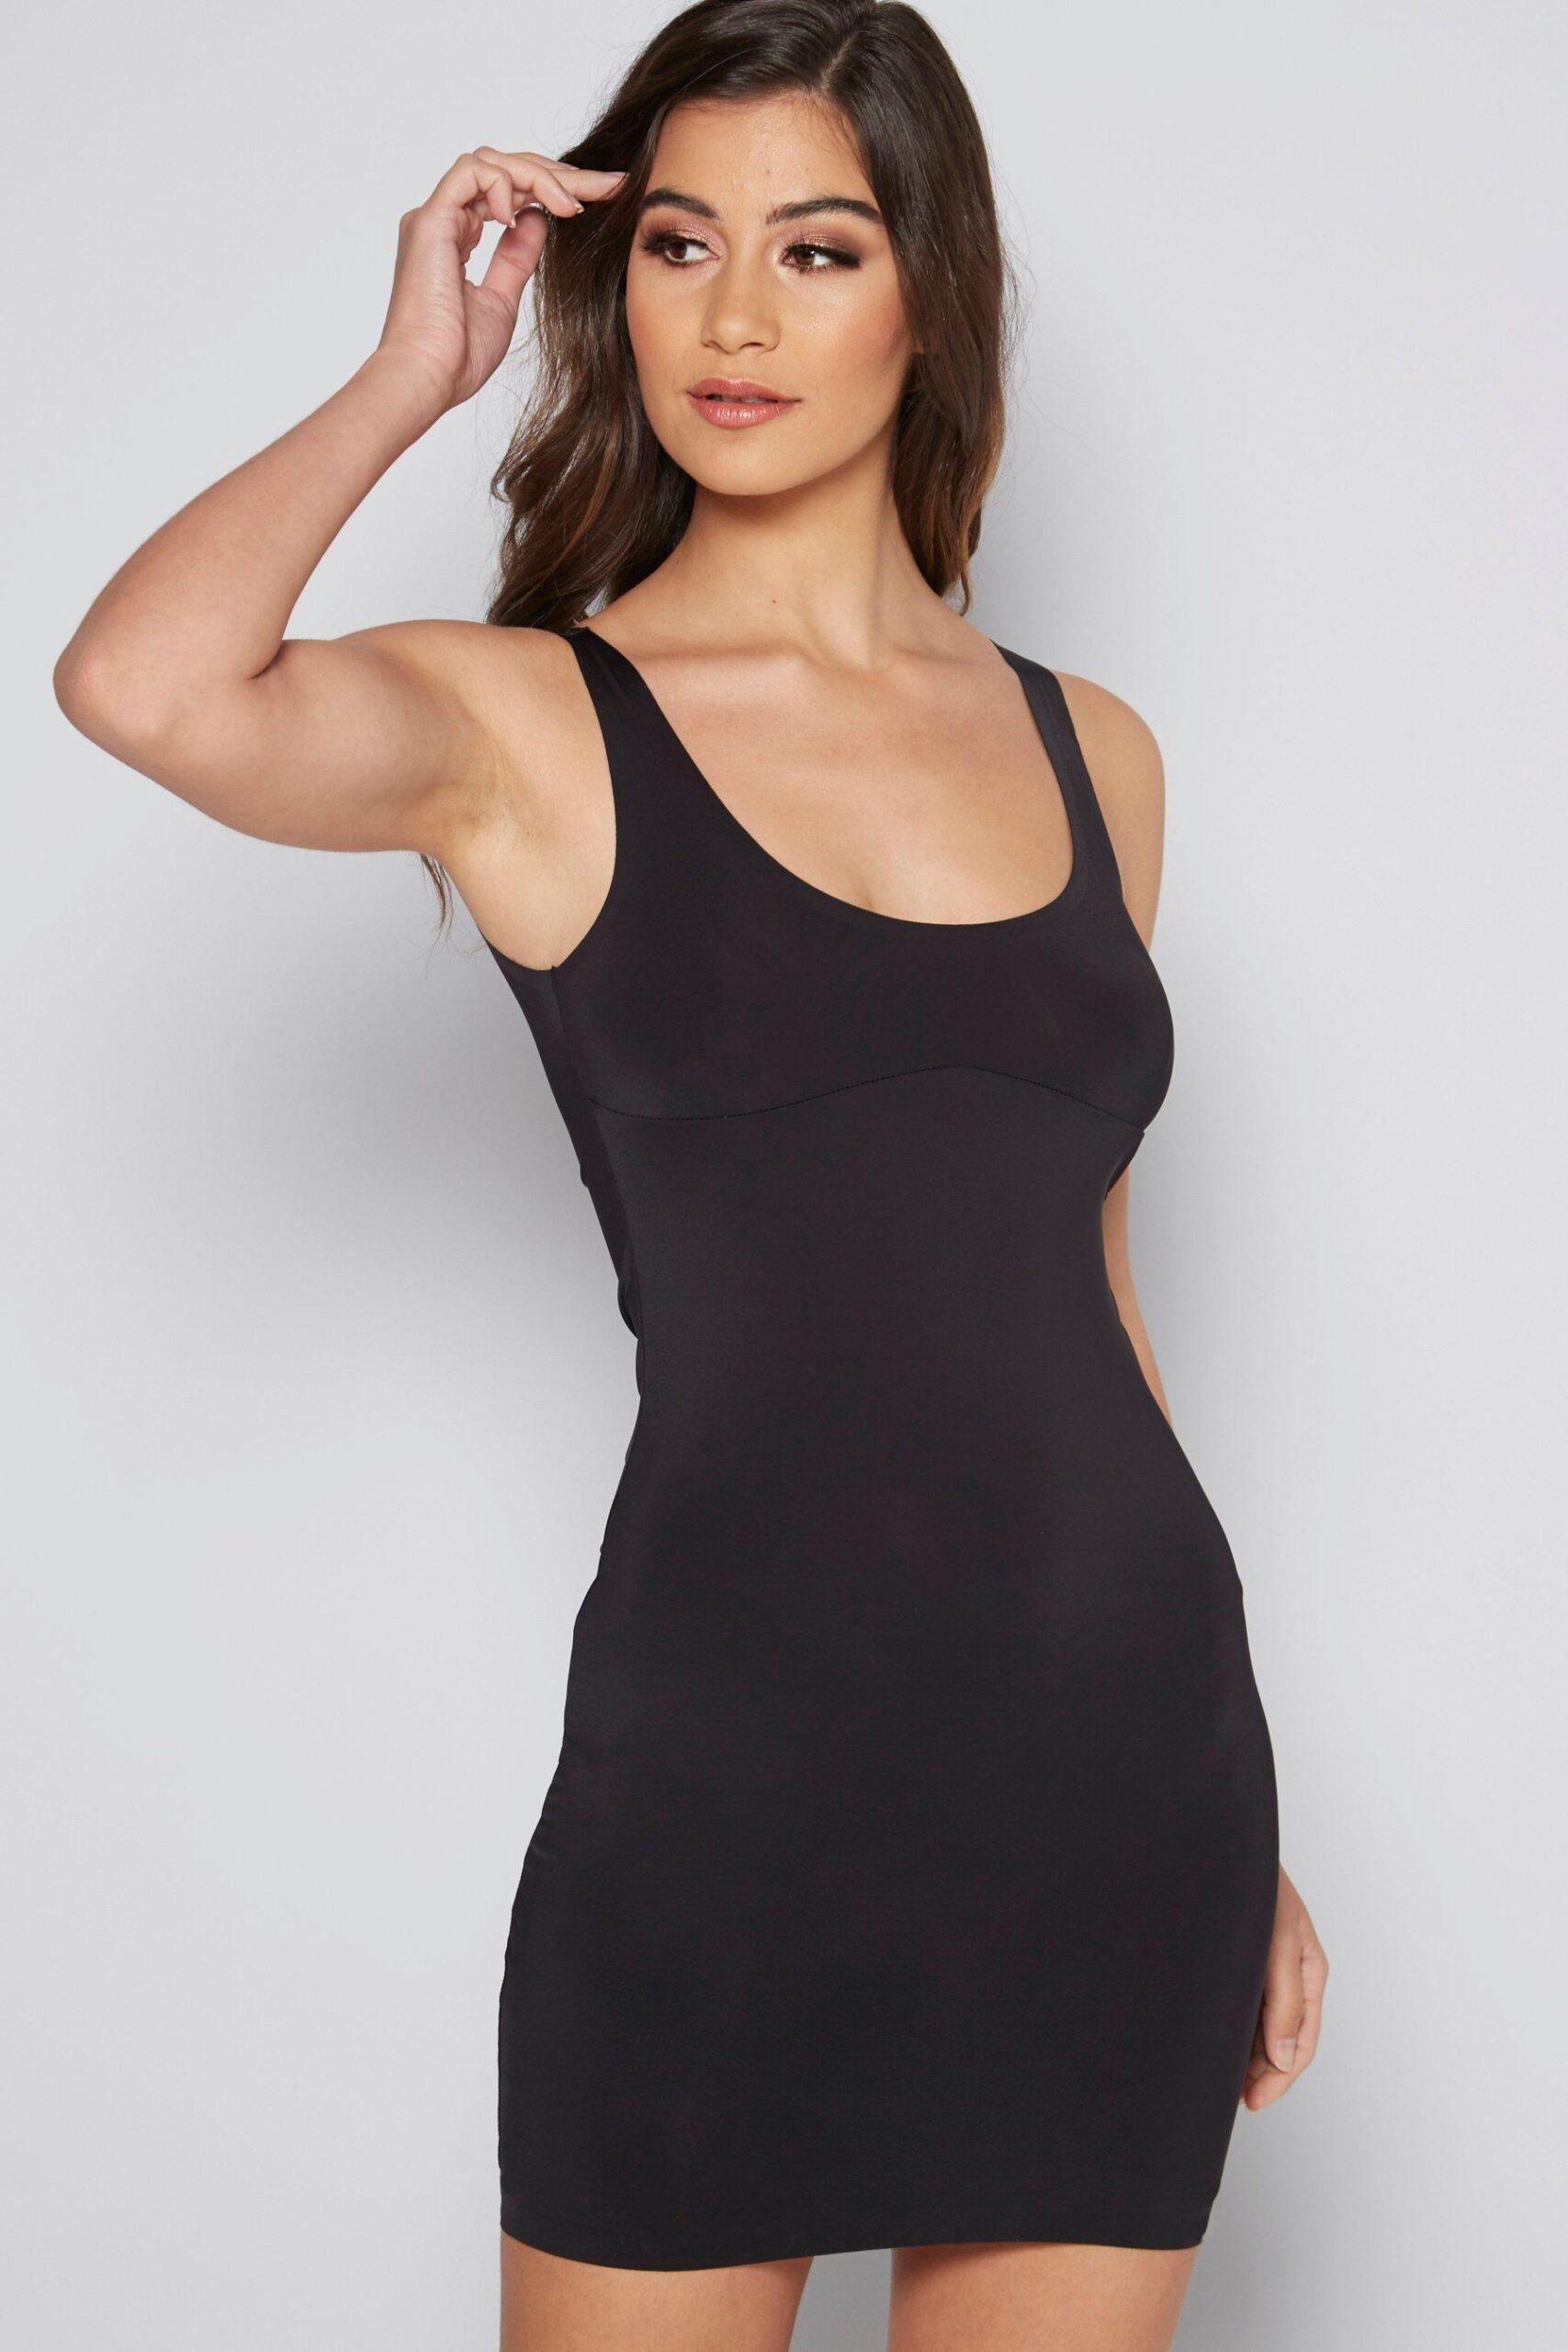 Smooth Line Control Dress